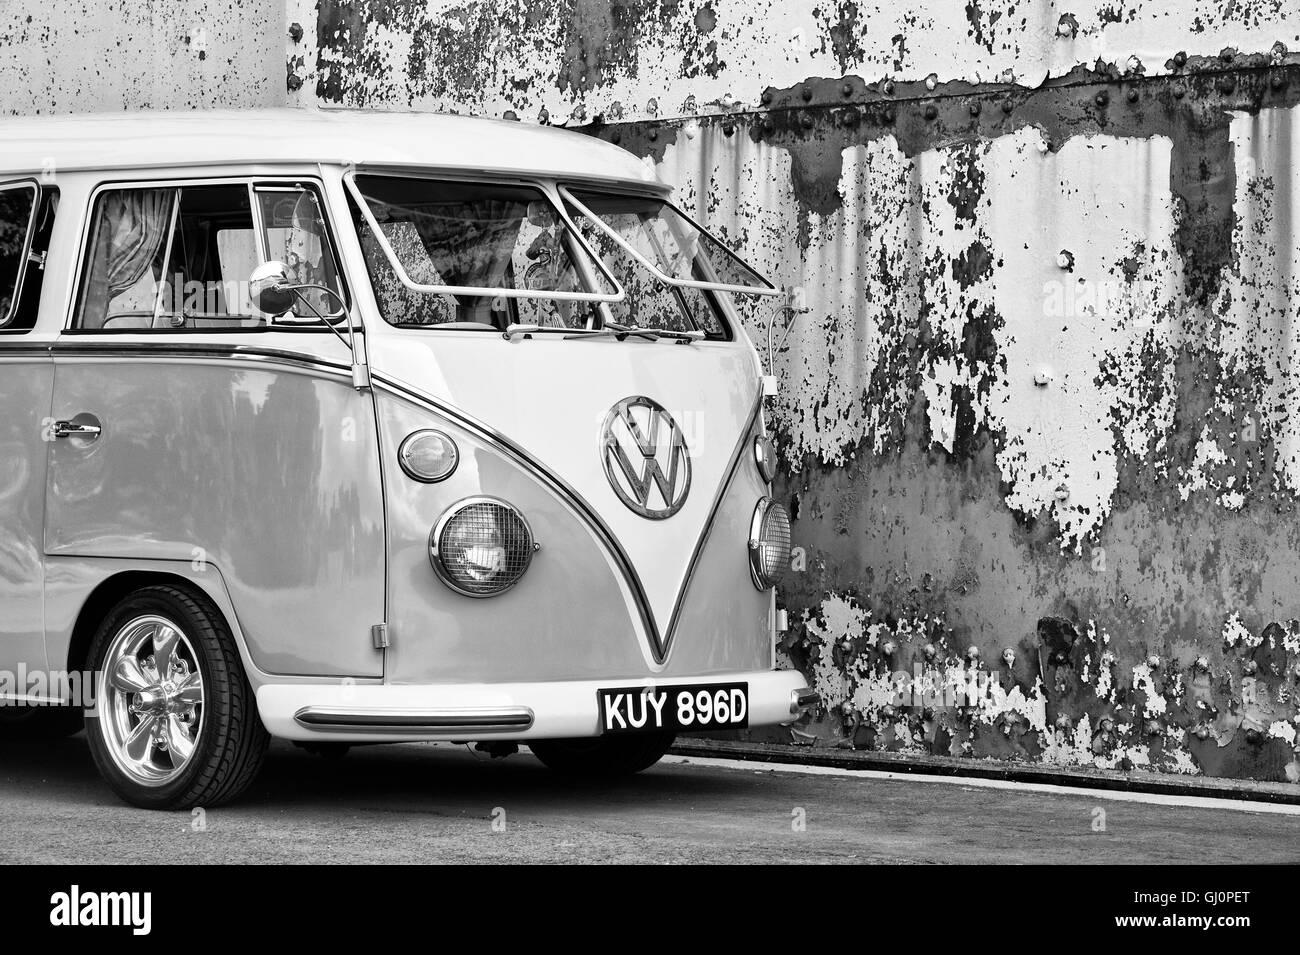 1966 VW Split Screen Volkswagen camper van. Bicester heritage centre, Oxfordshire, England. Black and White - Stock Image